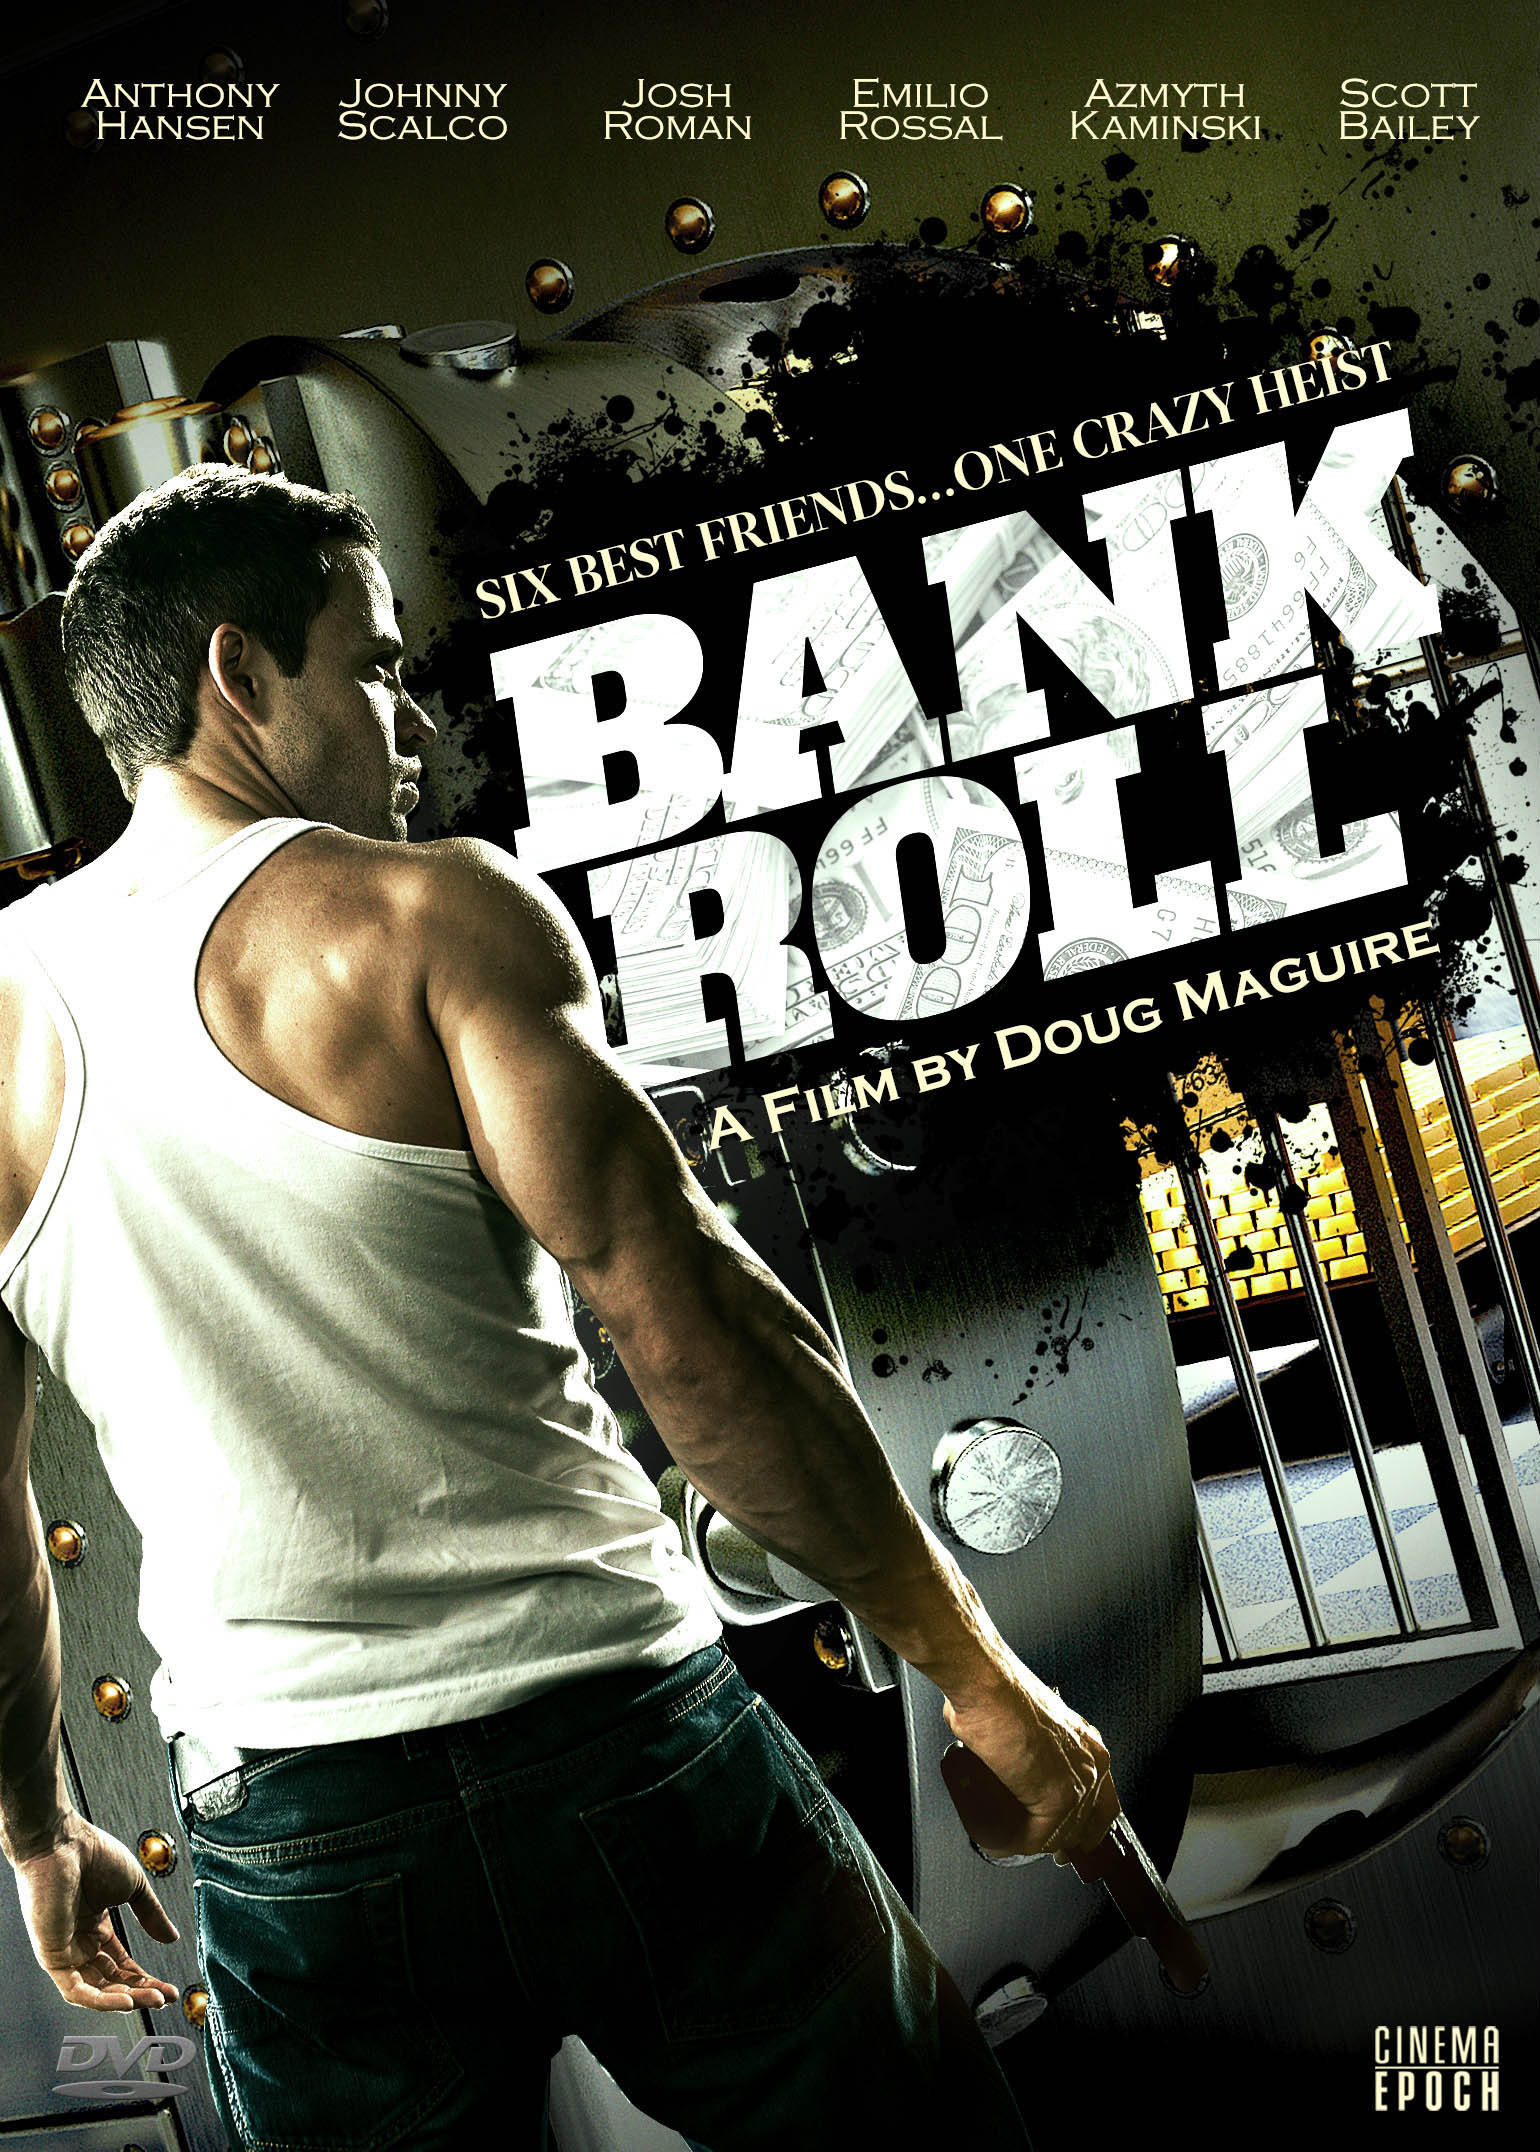 Scott Bailey, Josh Roman, Doug Maguire, Emilio Rossal, Azmyth Kaminski, Anthony Hansen, and John Scalco in Bank Roll (2012)